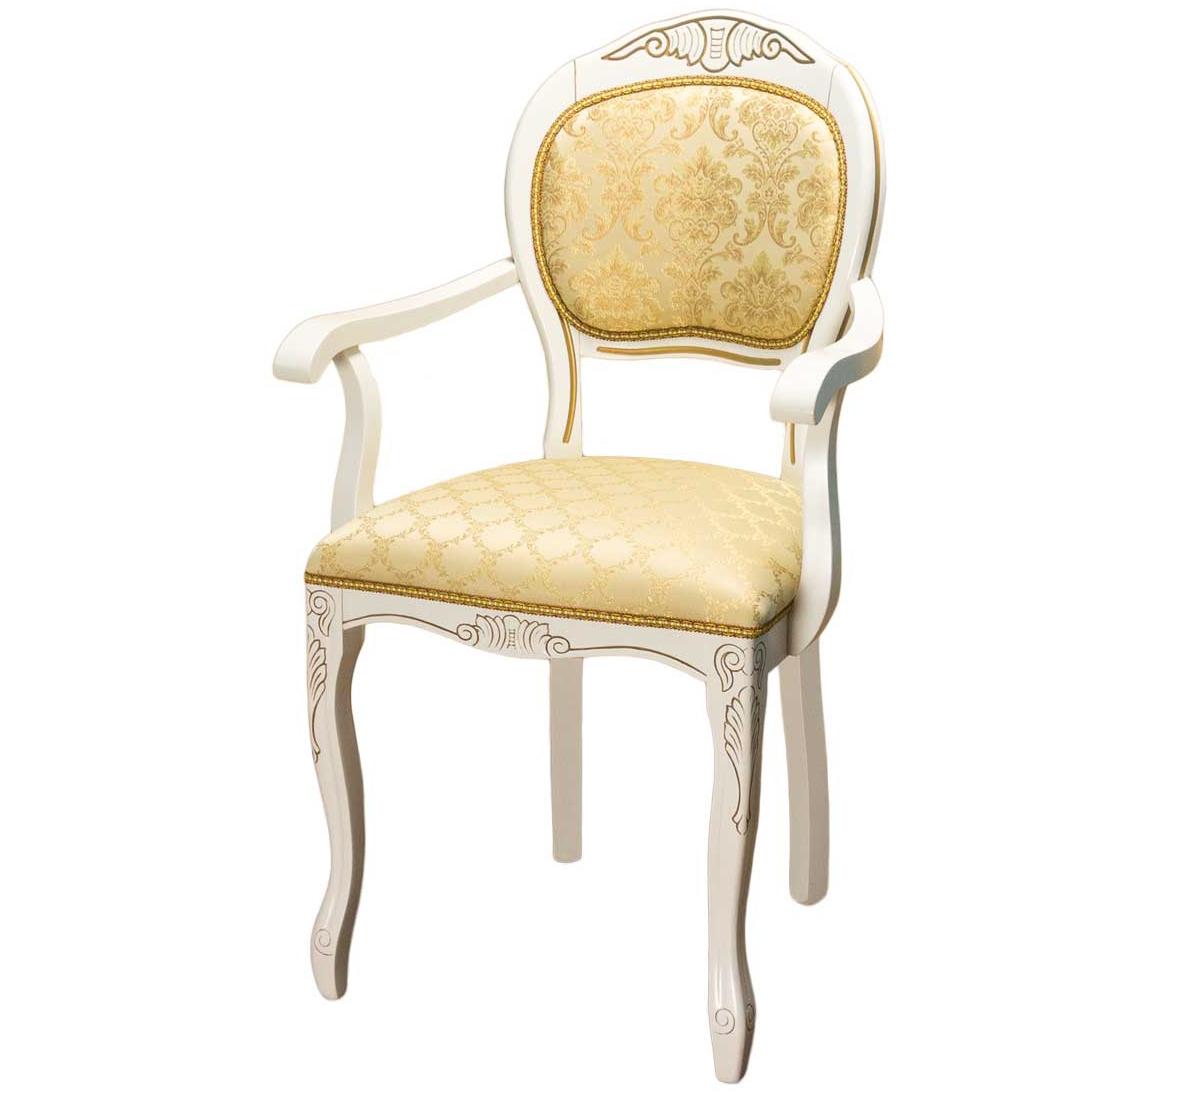 Кресло Лауро патина золото (арт. М3355)